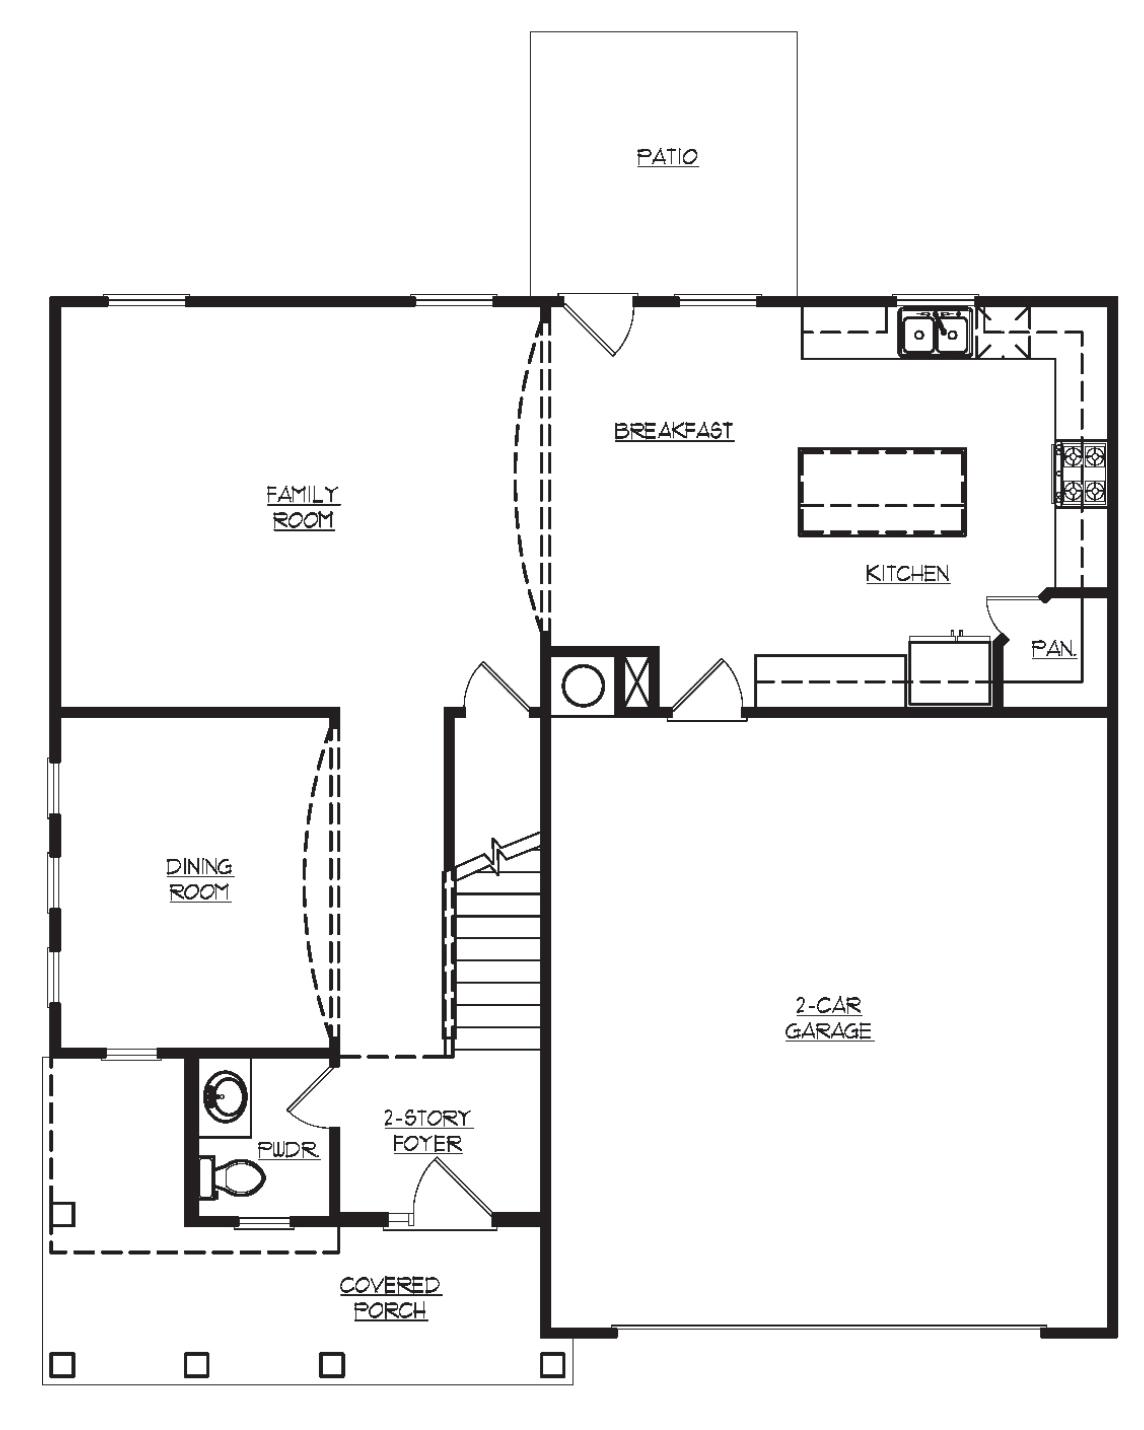 Magnolia kerley family homes - Magnolia homes floor plans ...